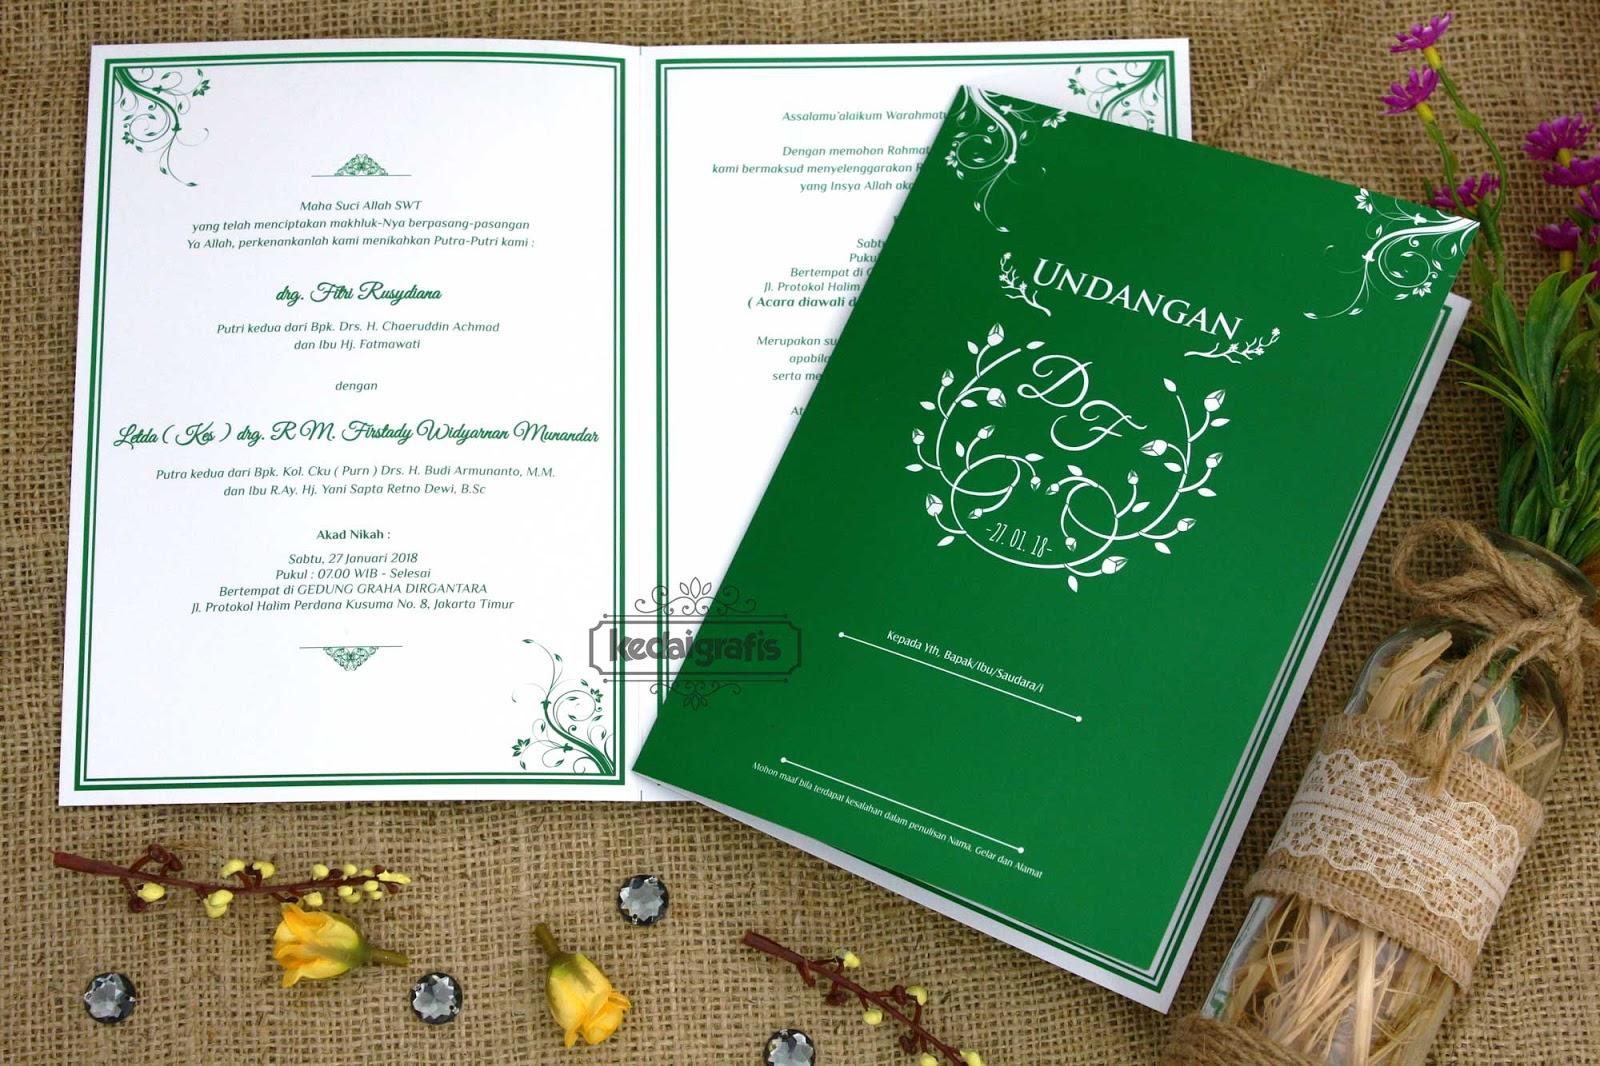 Contoh Surat Undangan Pernikahan Unik Suratmenyurat Net